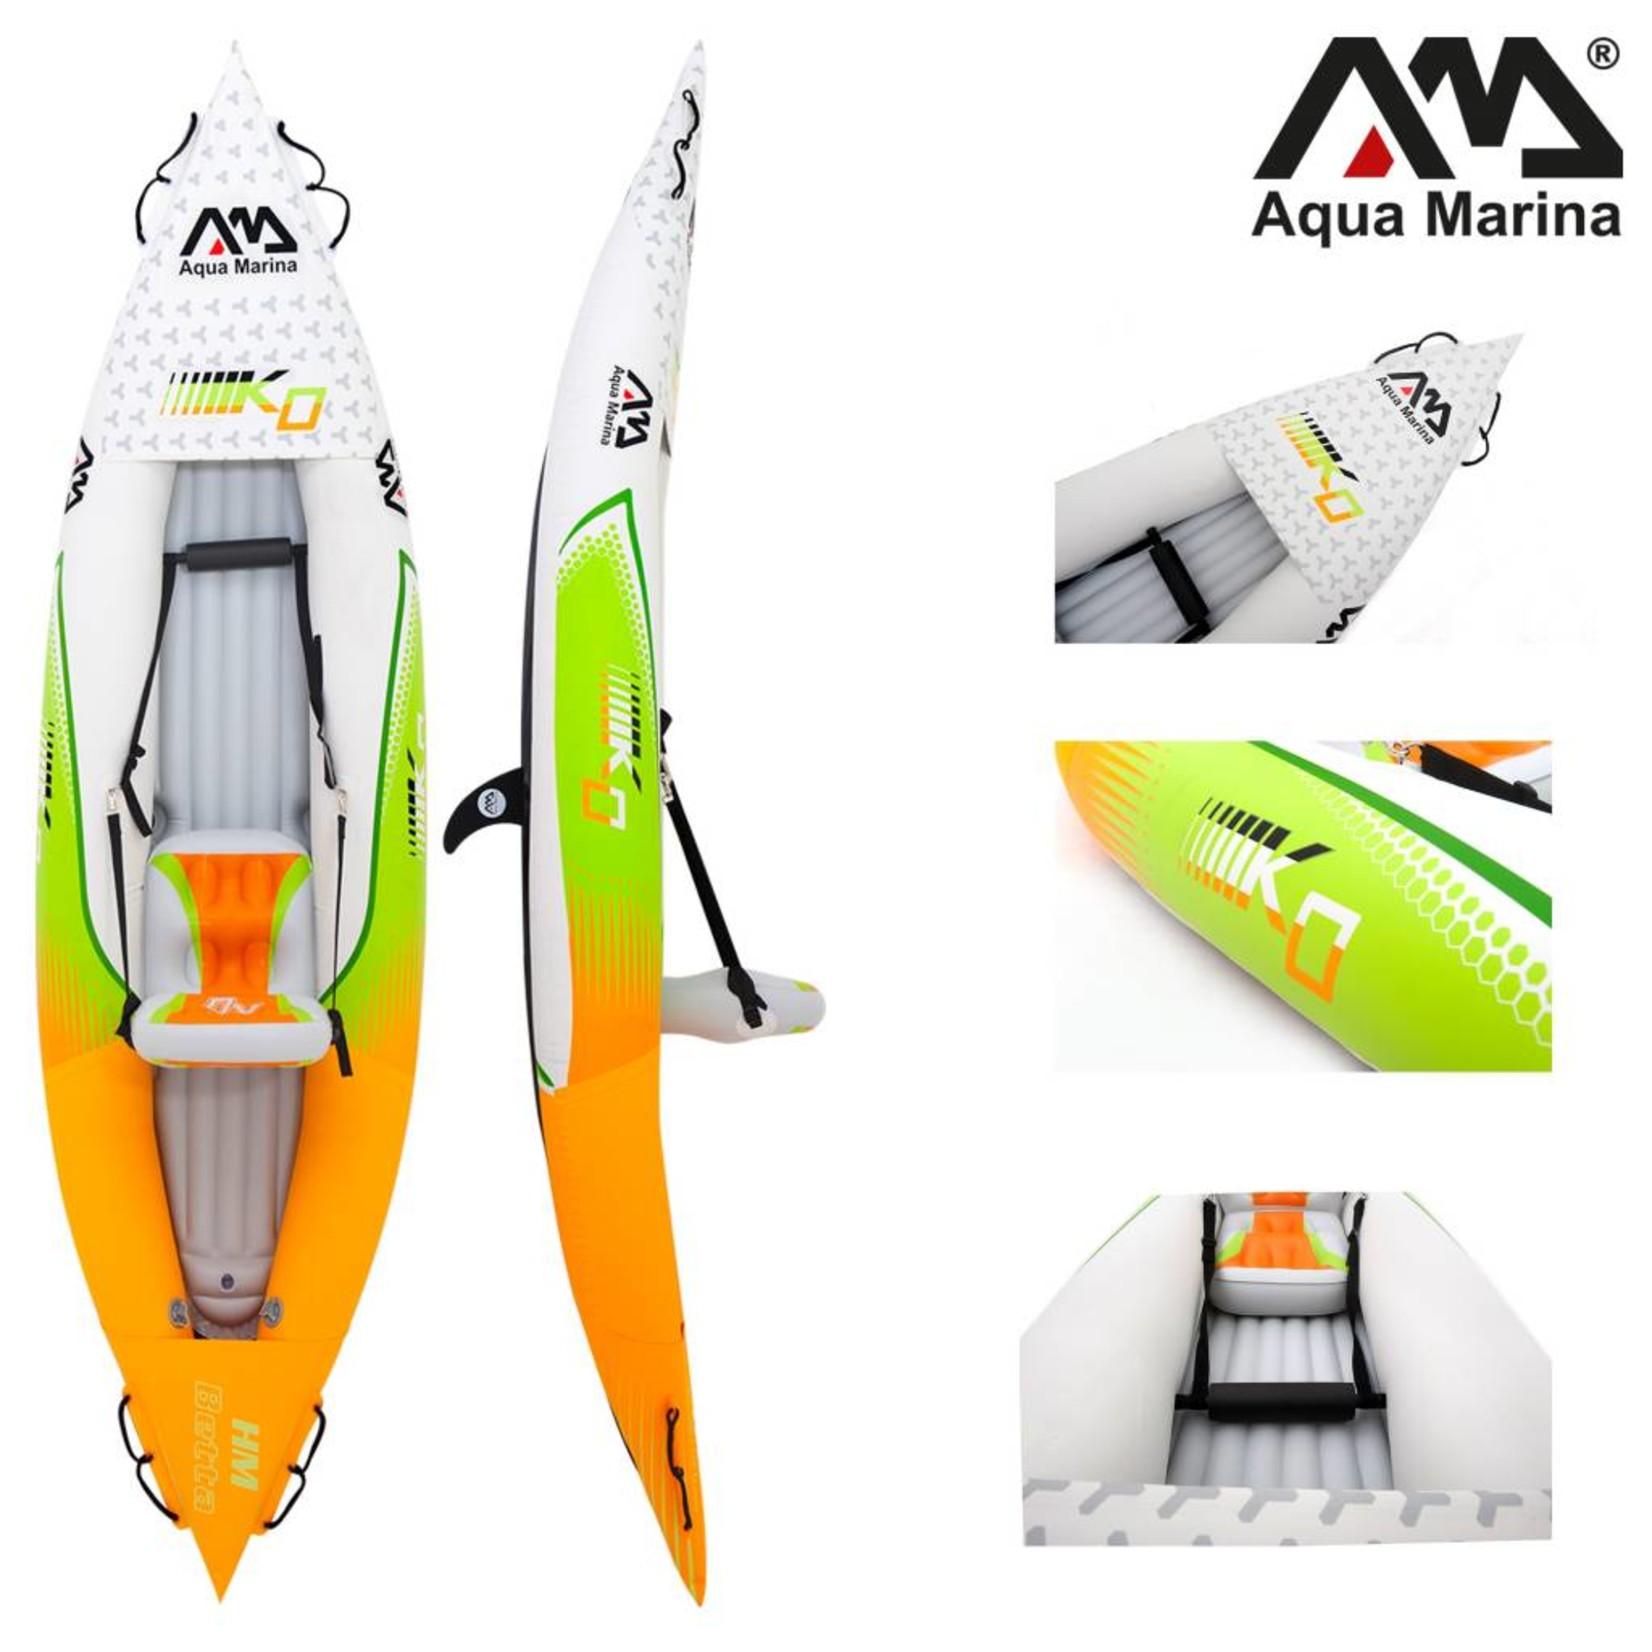 Aqua Marina Betta HM K0 One - Opblaasbare Kajak met Peddel